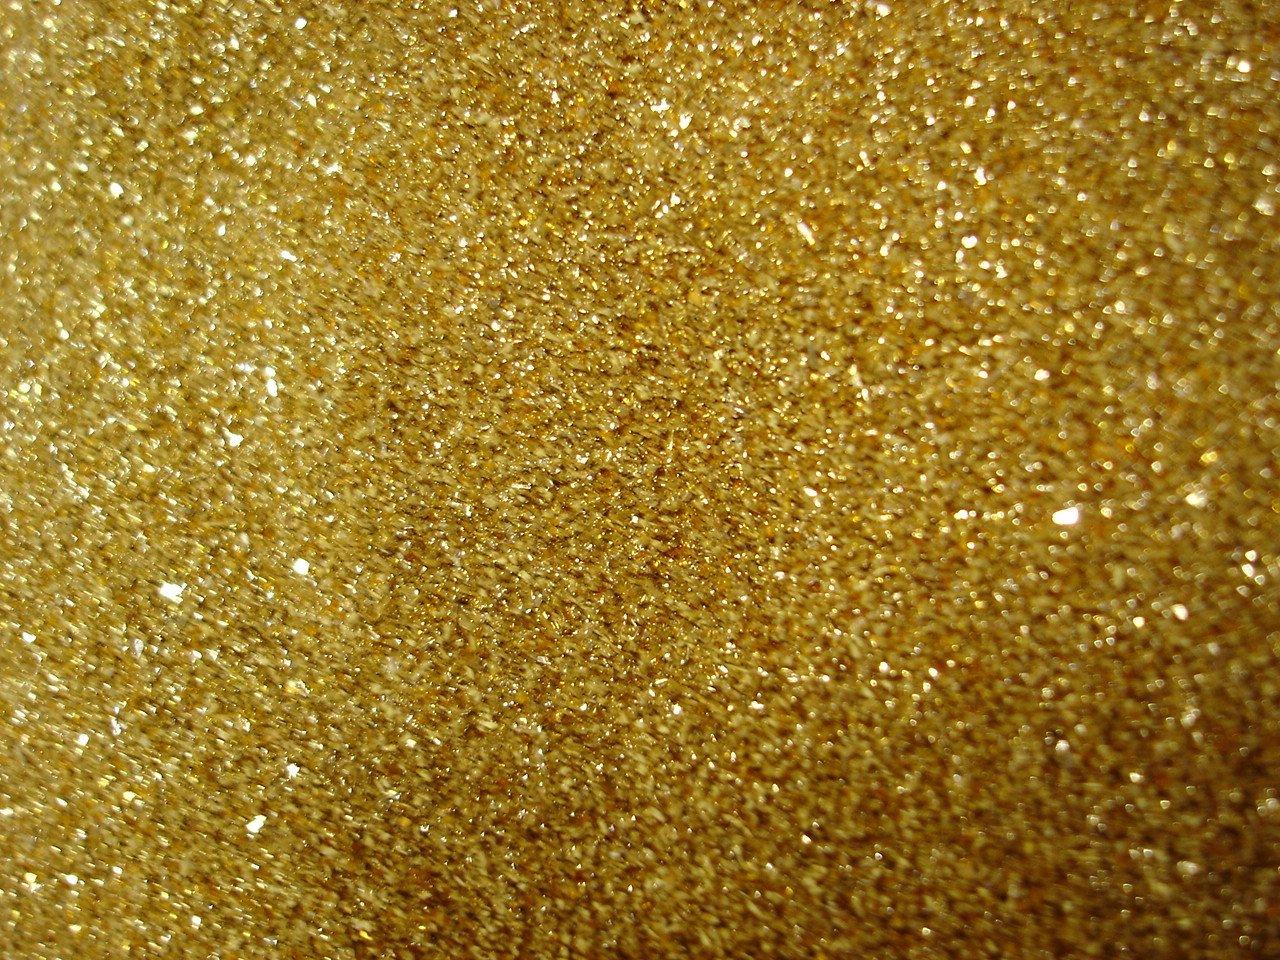 Black And Gold Desktop Wallpaper